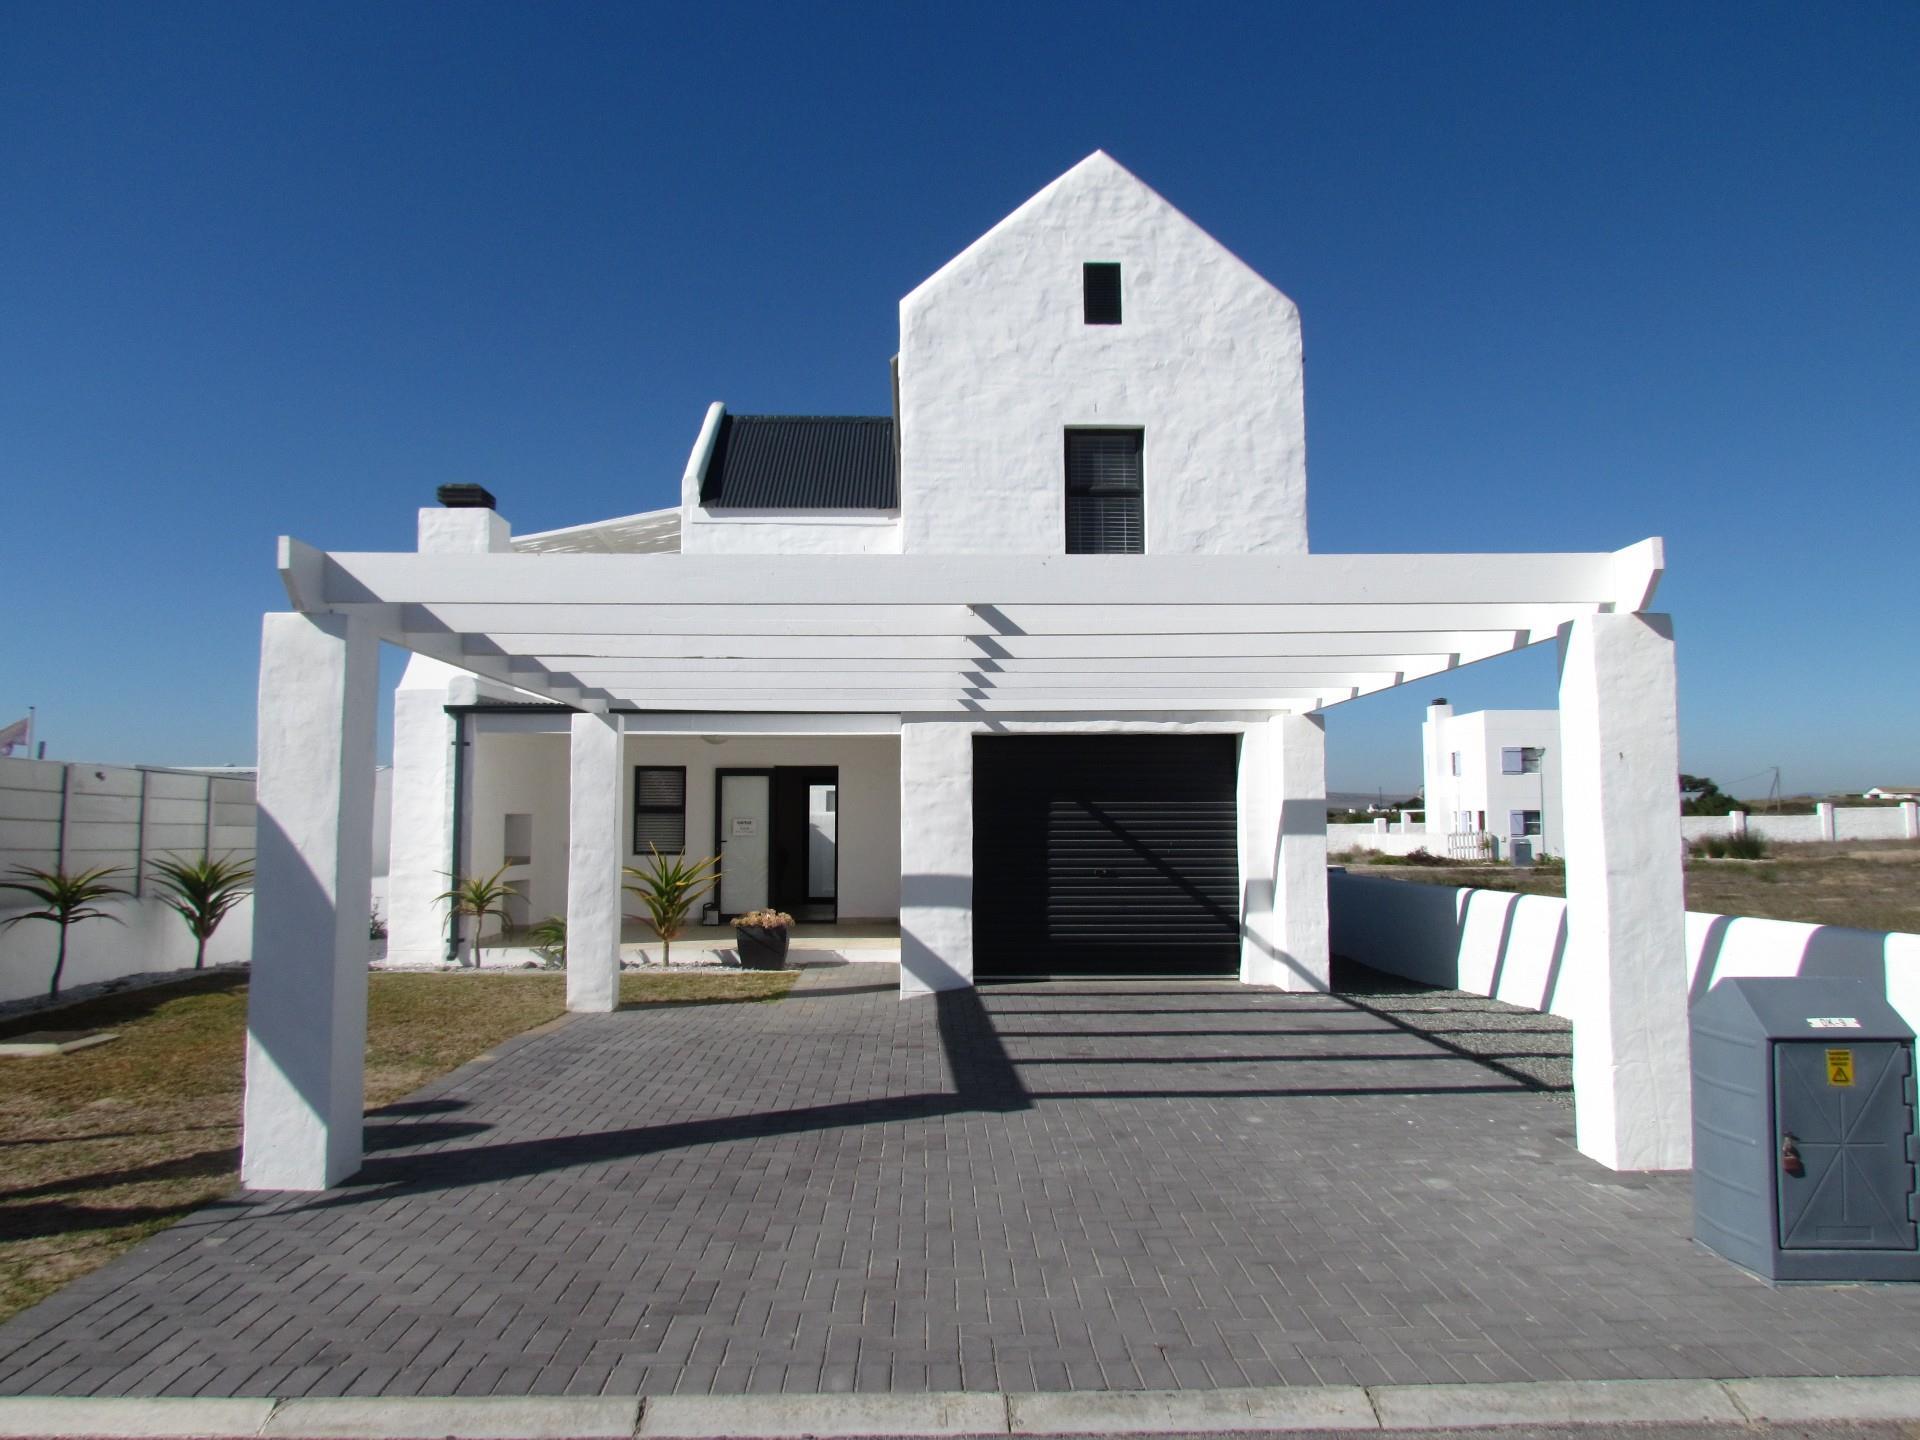 Yzerfontein Yzerfontein Property Houses For Sale